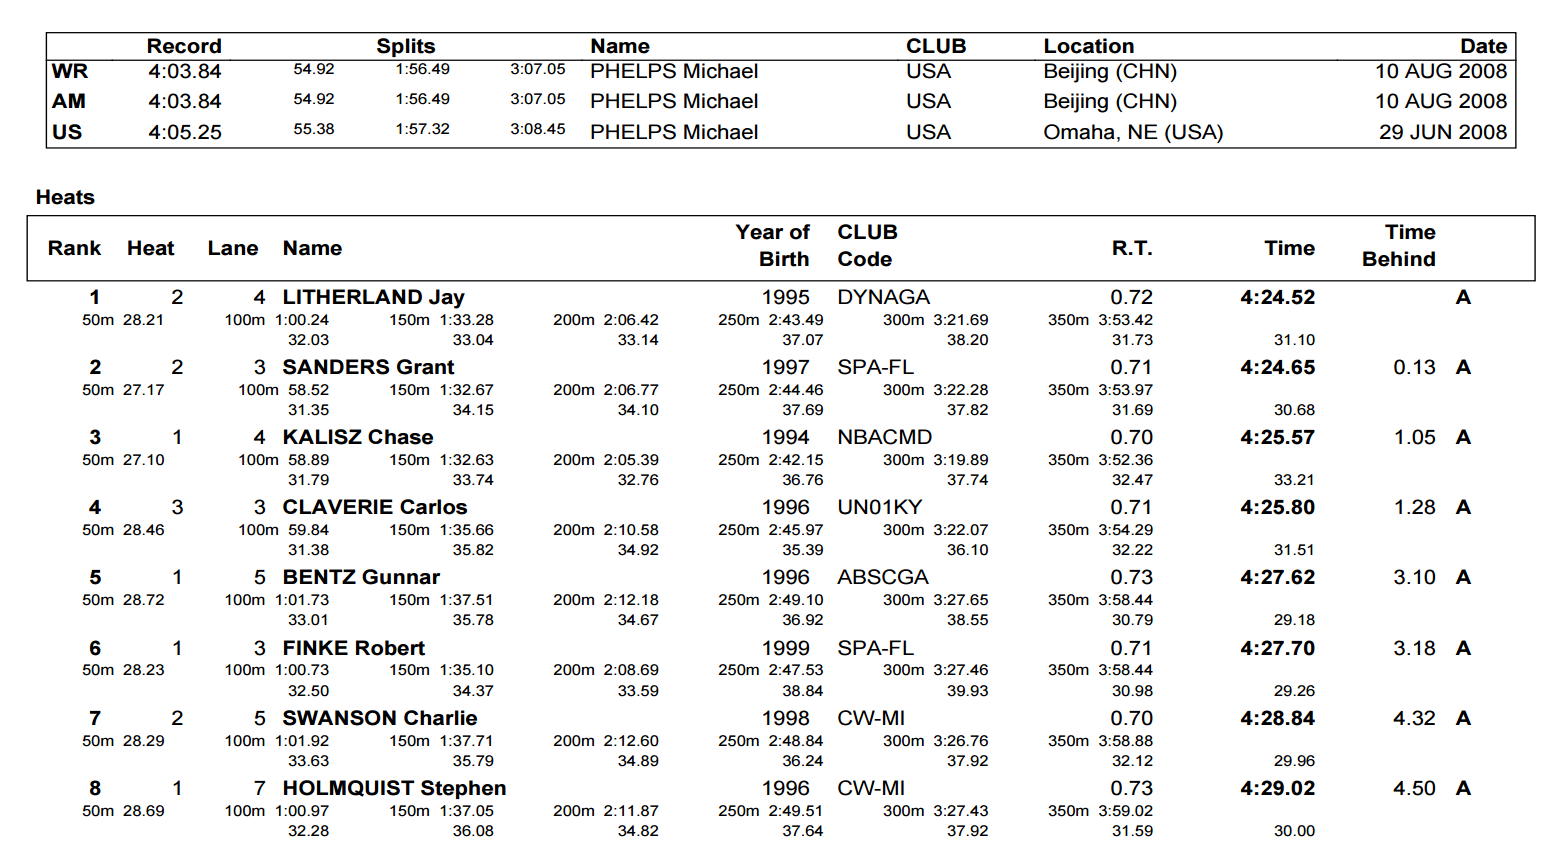 Ledecky Manuel Shine On Day 3 Prelims Of Arena Pro Swim